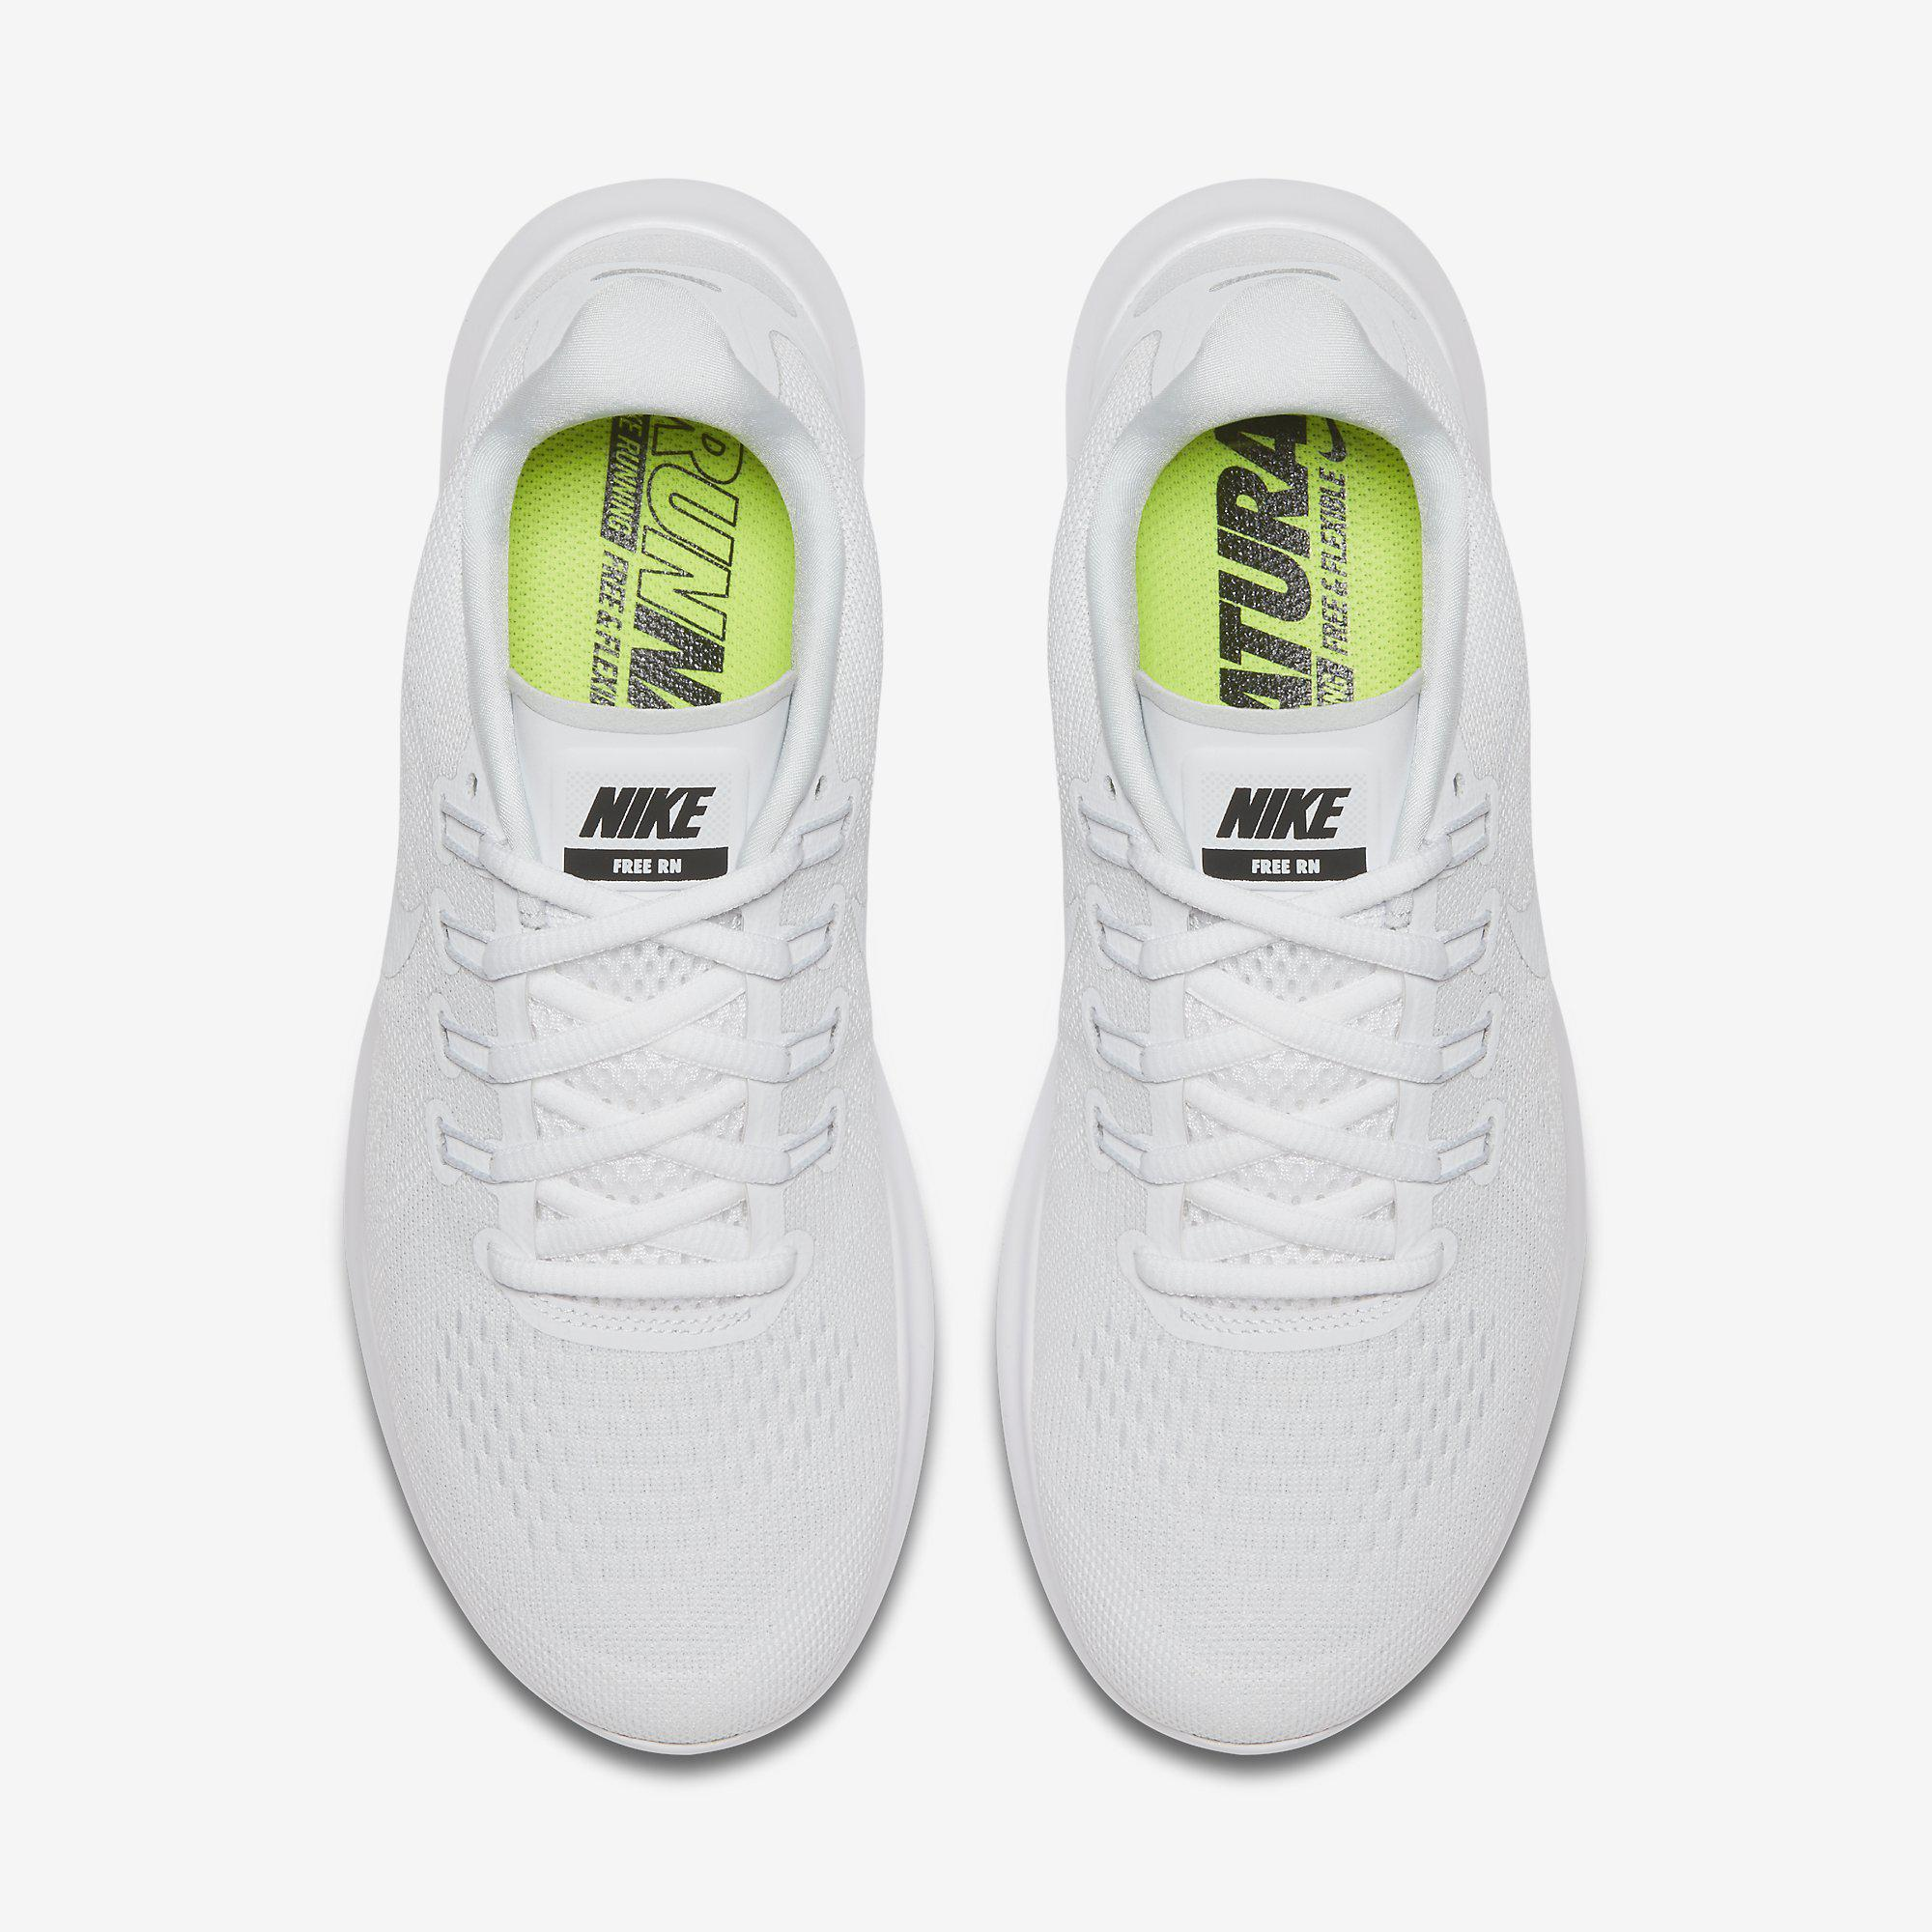 f234f9f9c737d Nike Womens Free RN 2017 Running Shoes - White - Tennisnuts.com